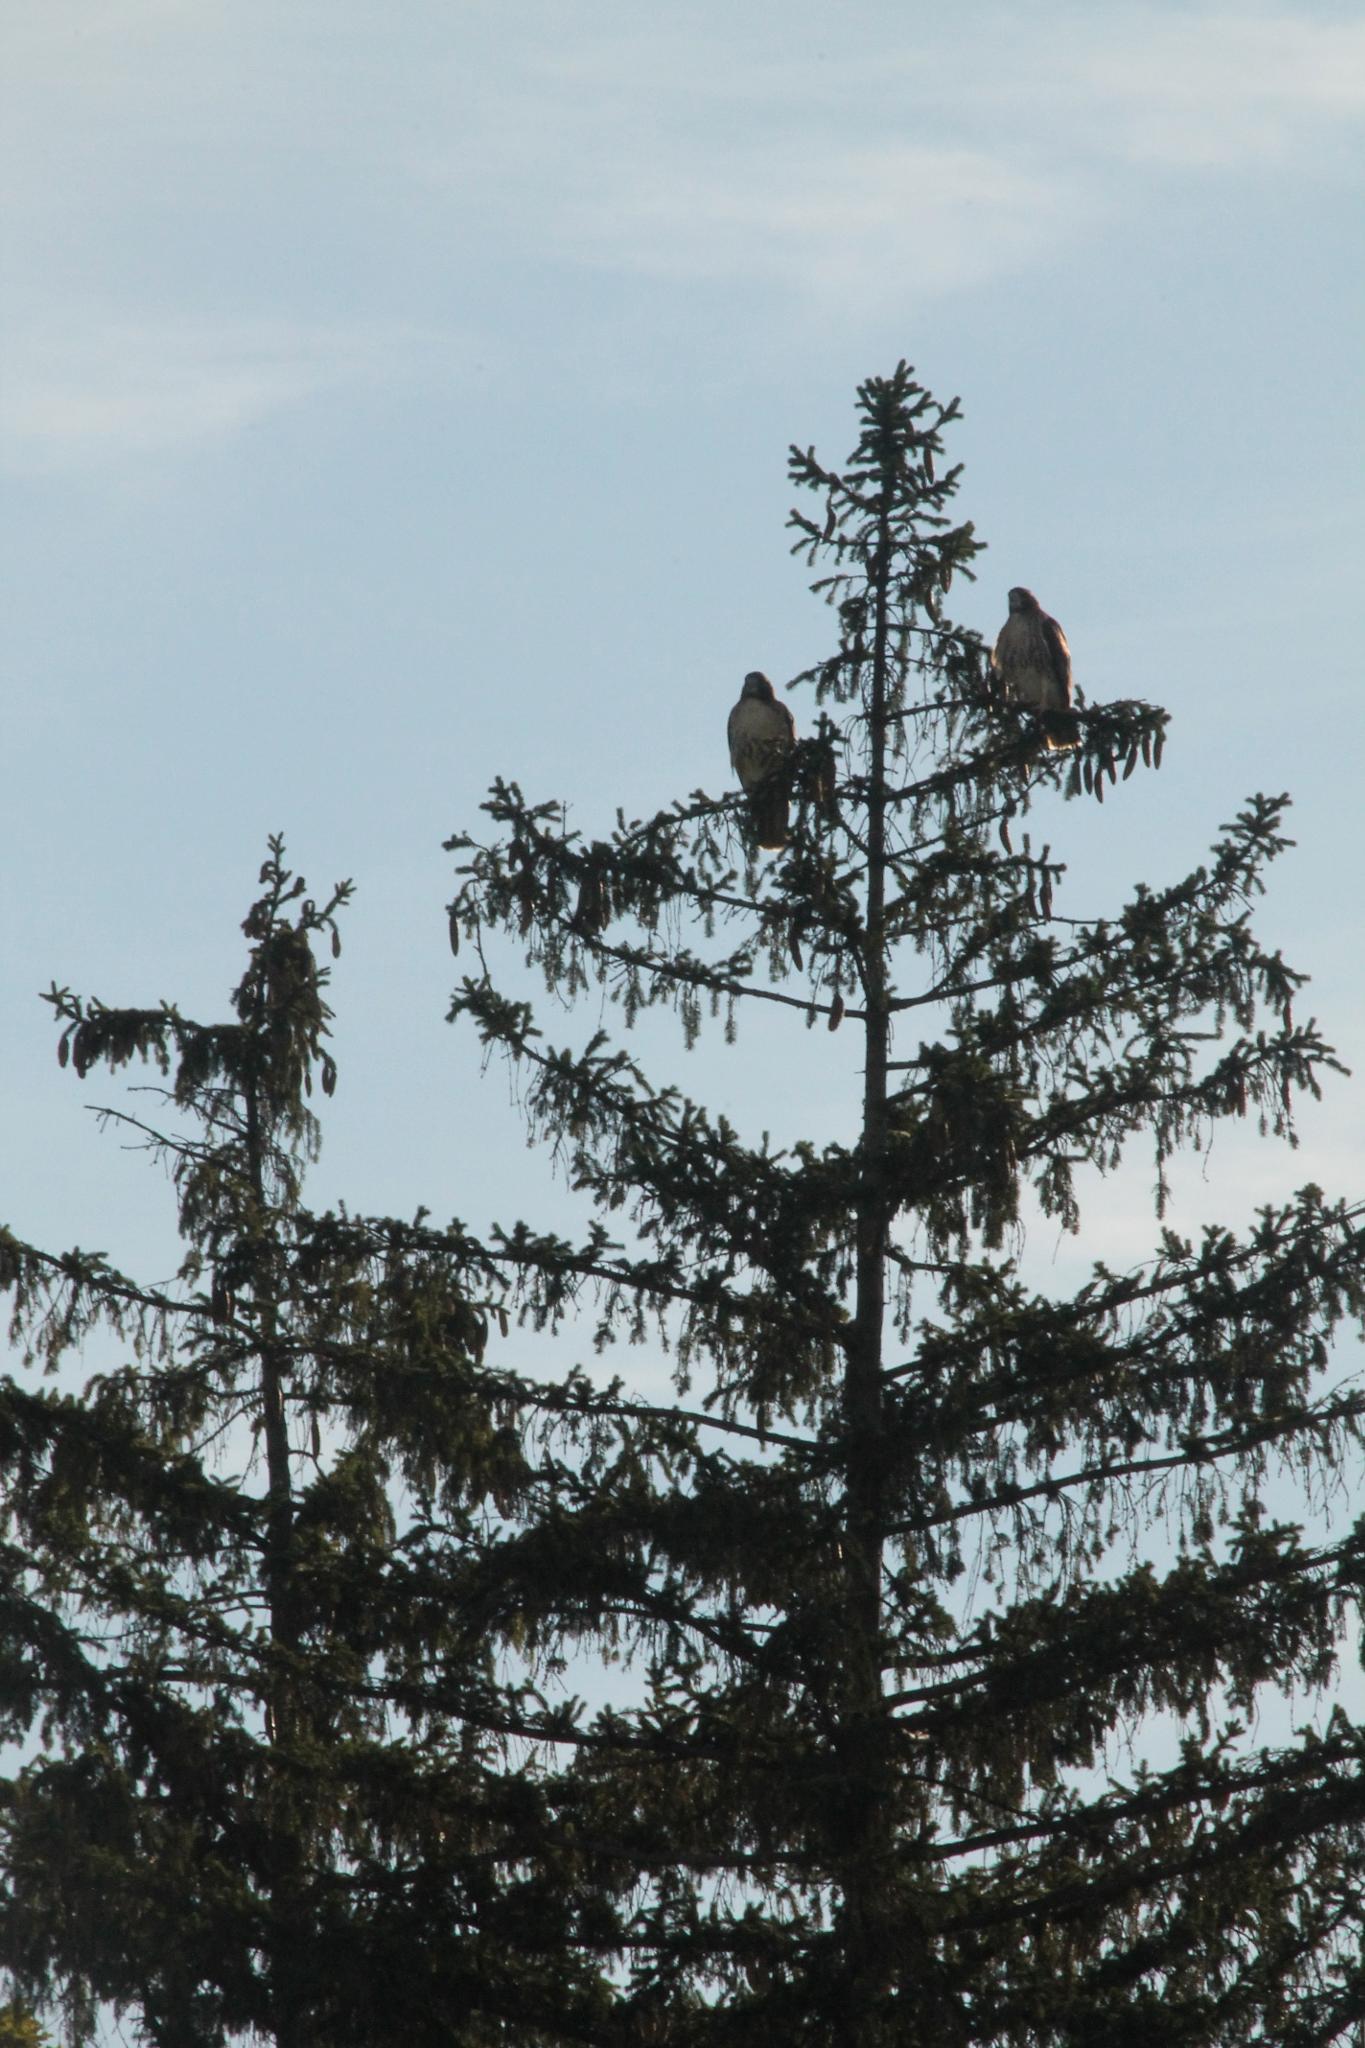 Two Hawks in the Pine =? by Bebet Blue Amazon